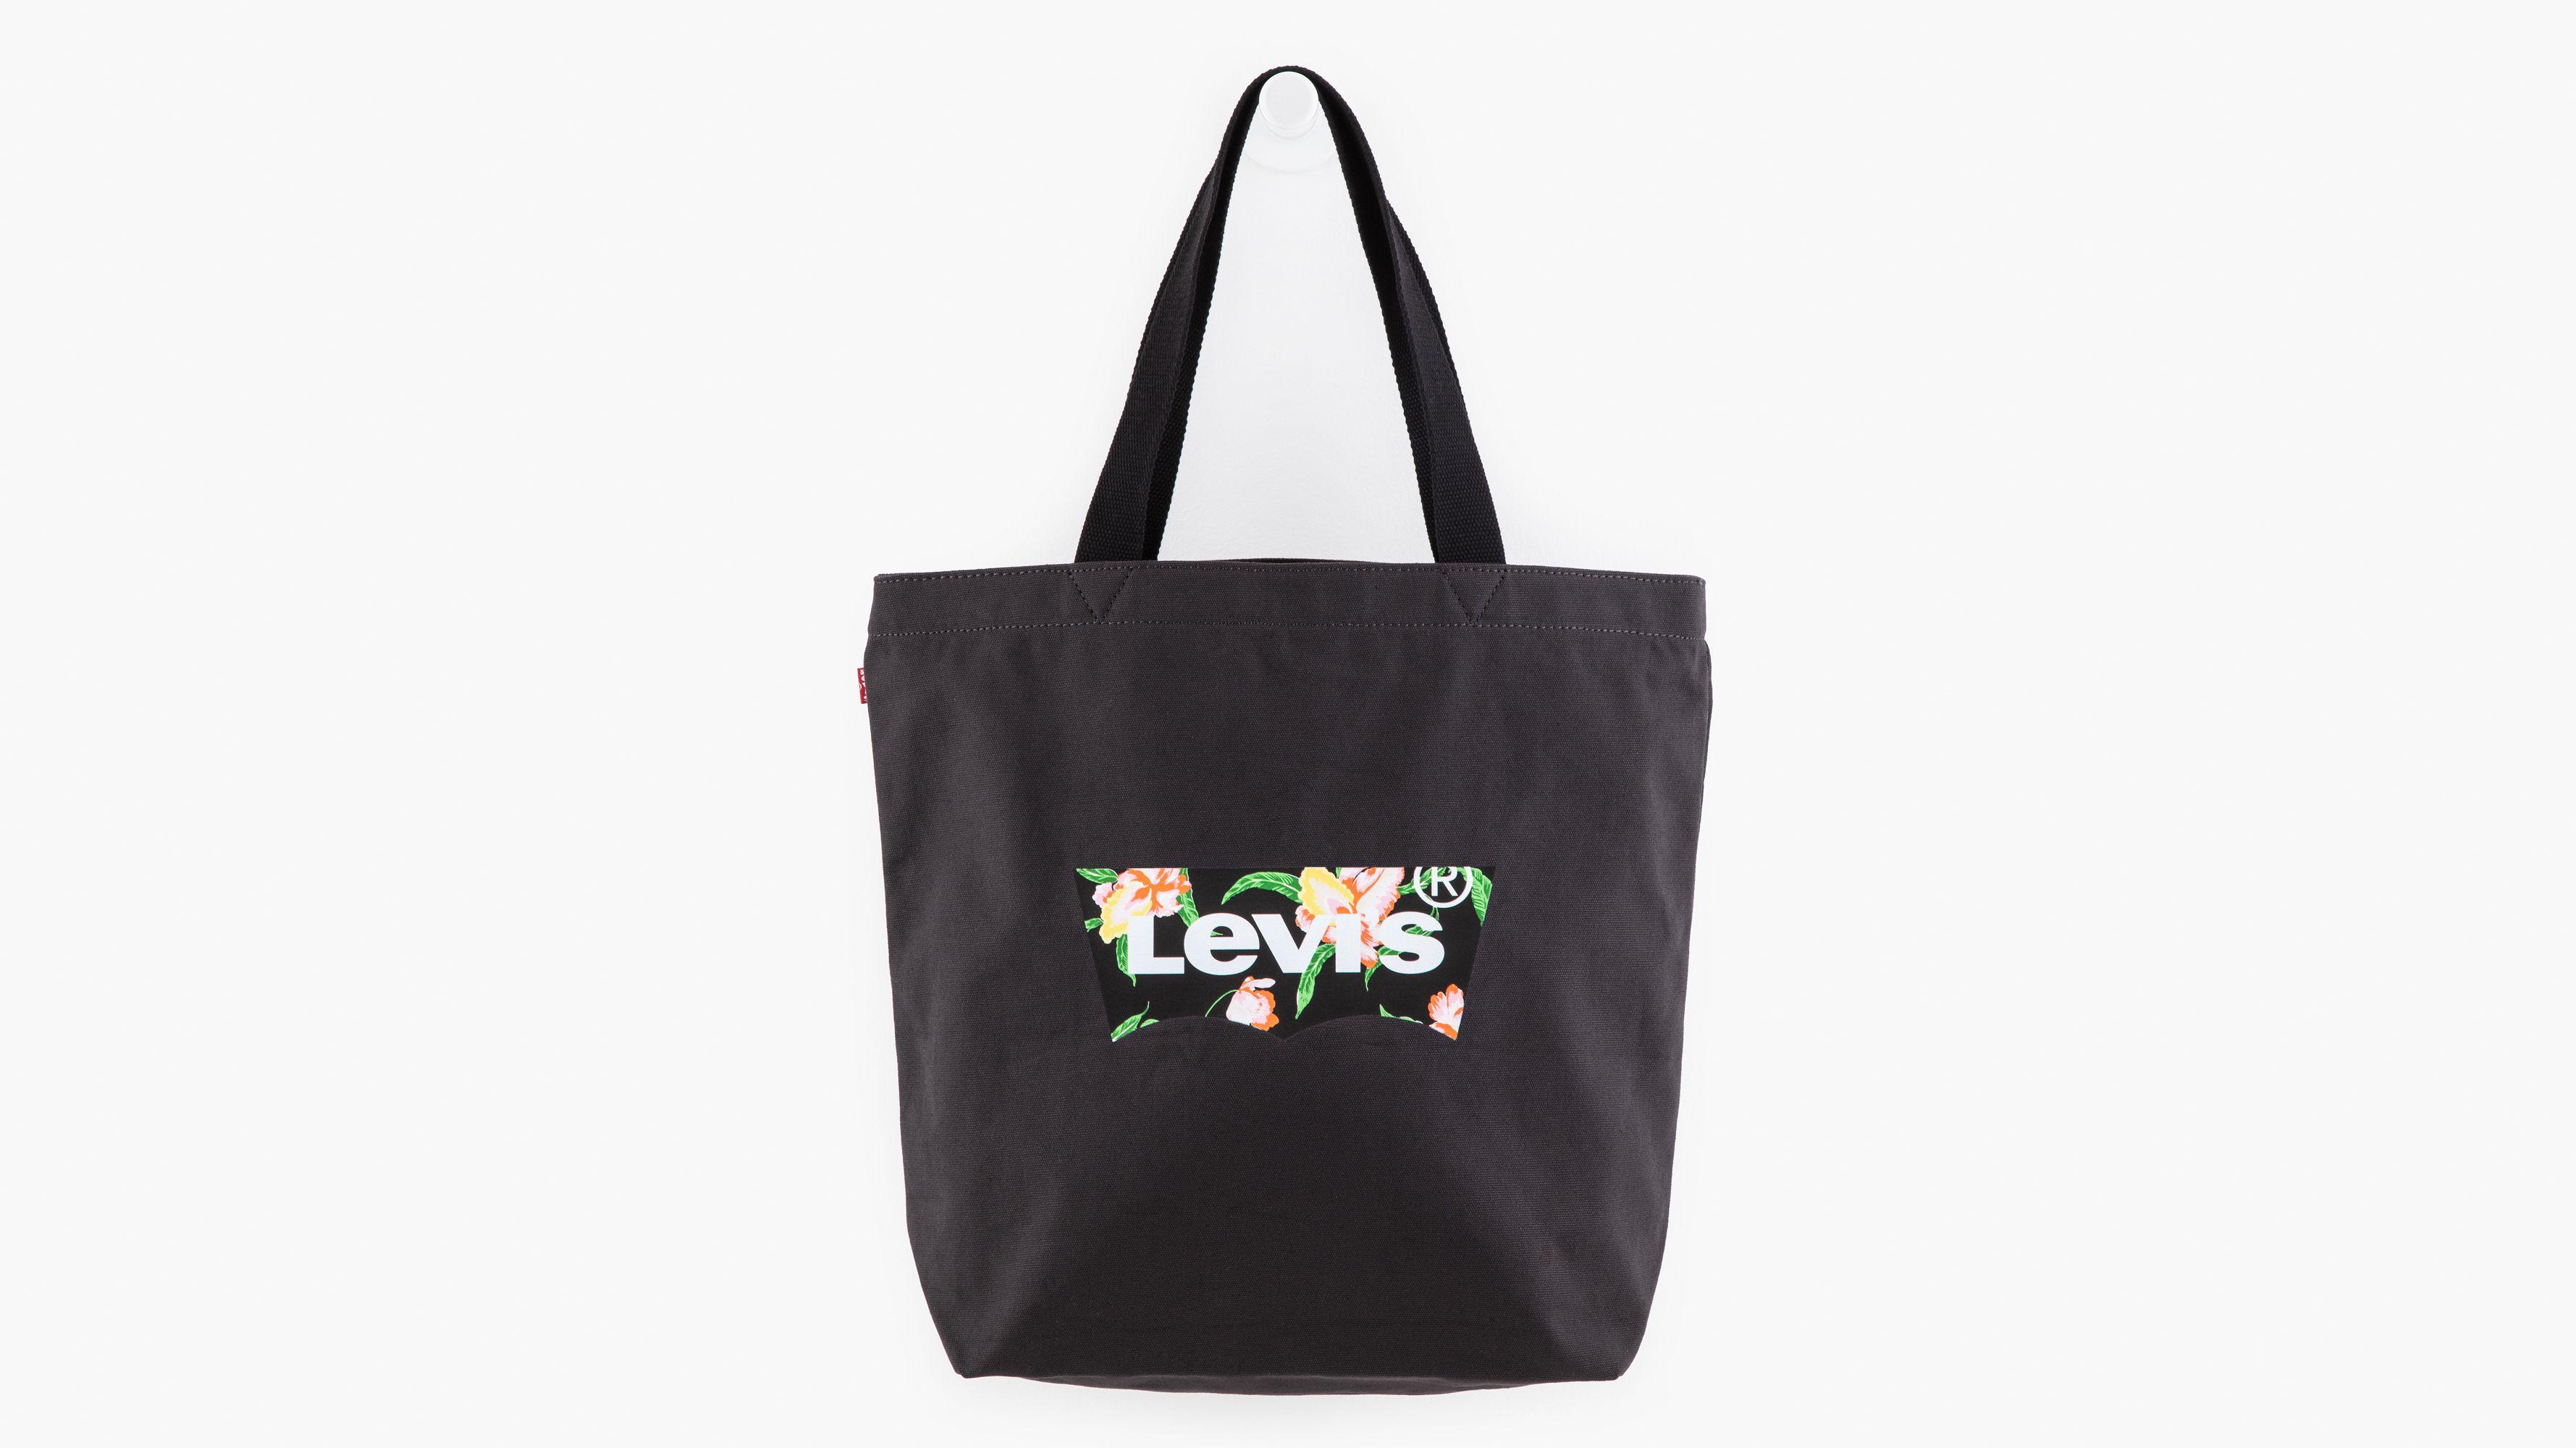 Levi2019s00ae Floral Print Tote Bag